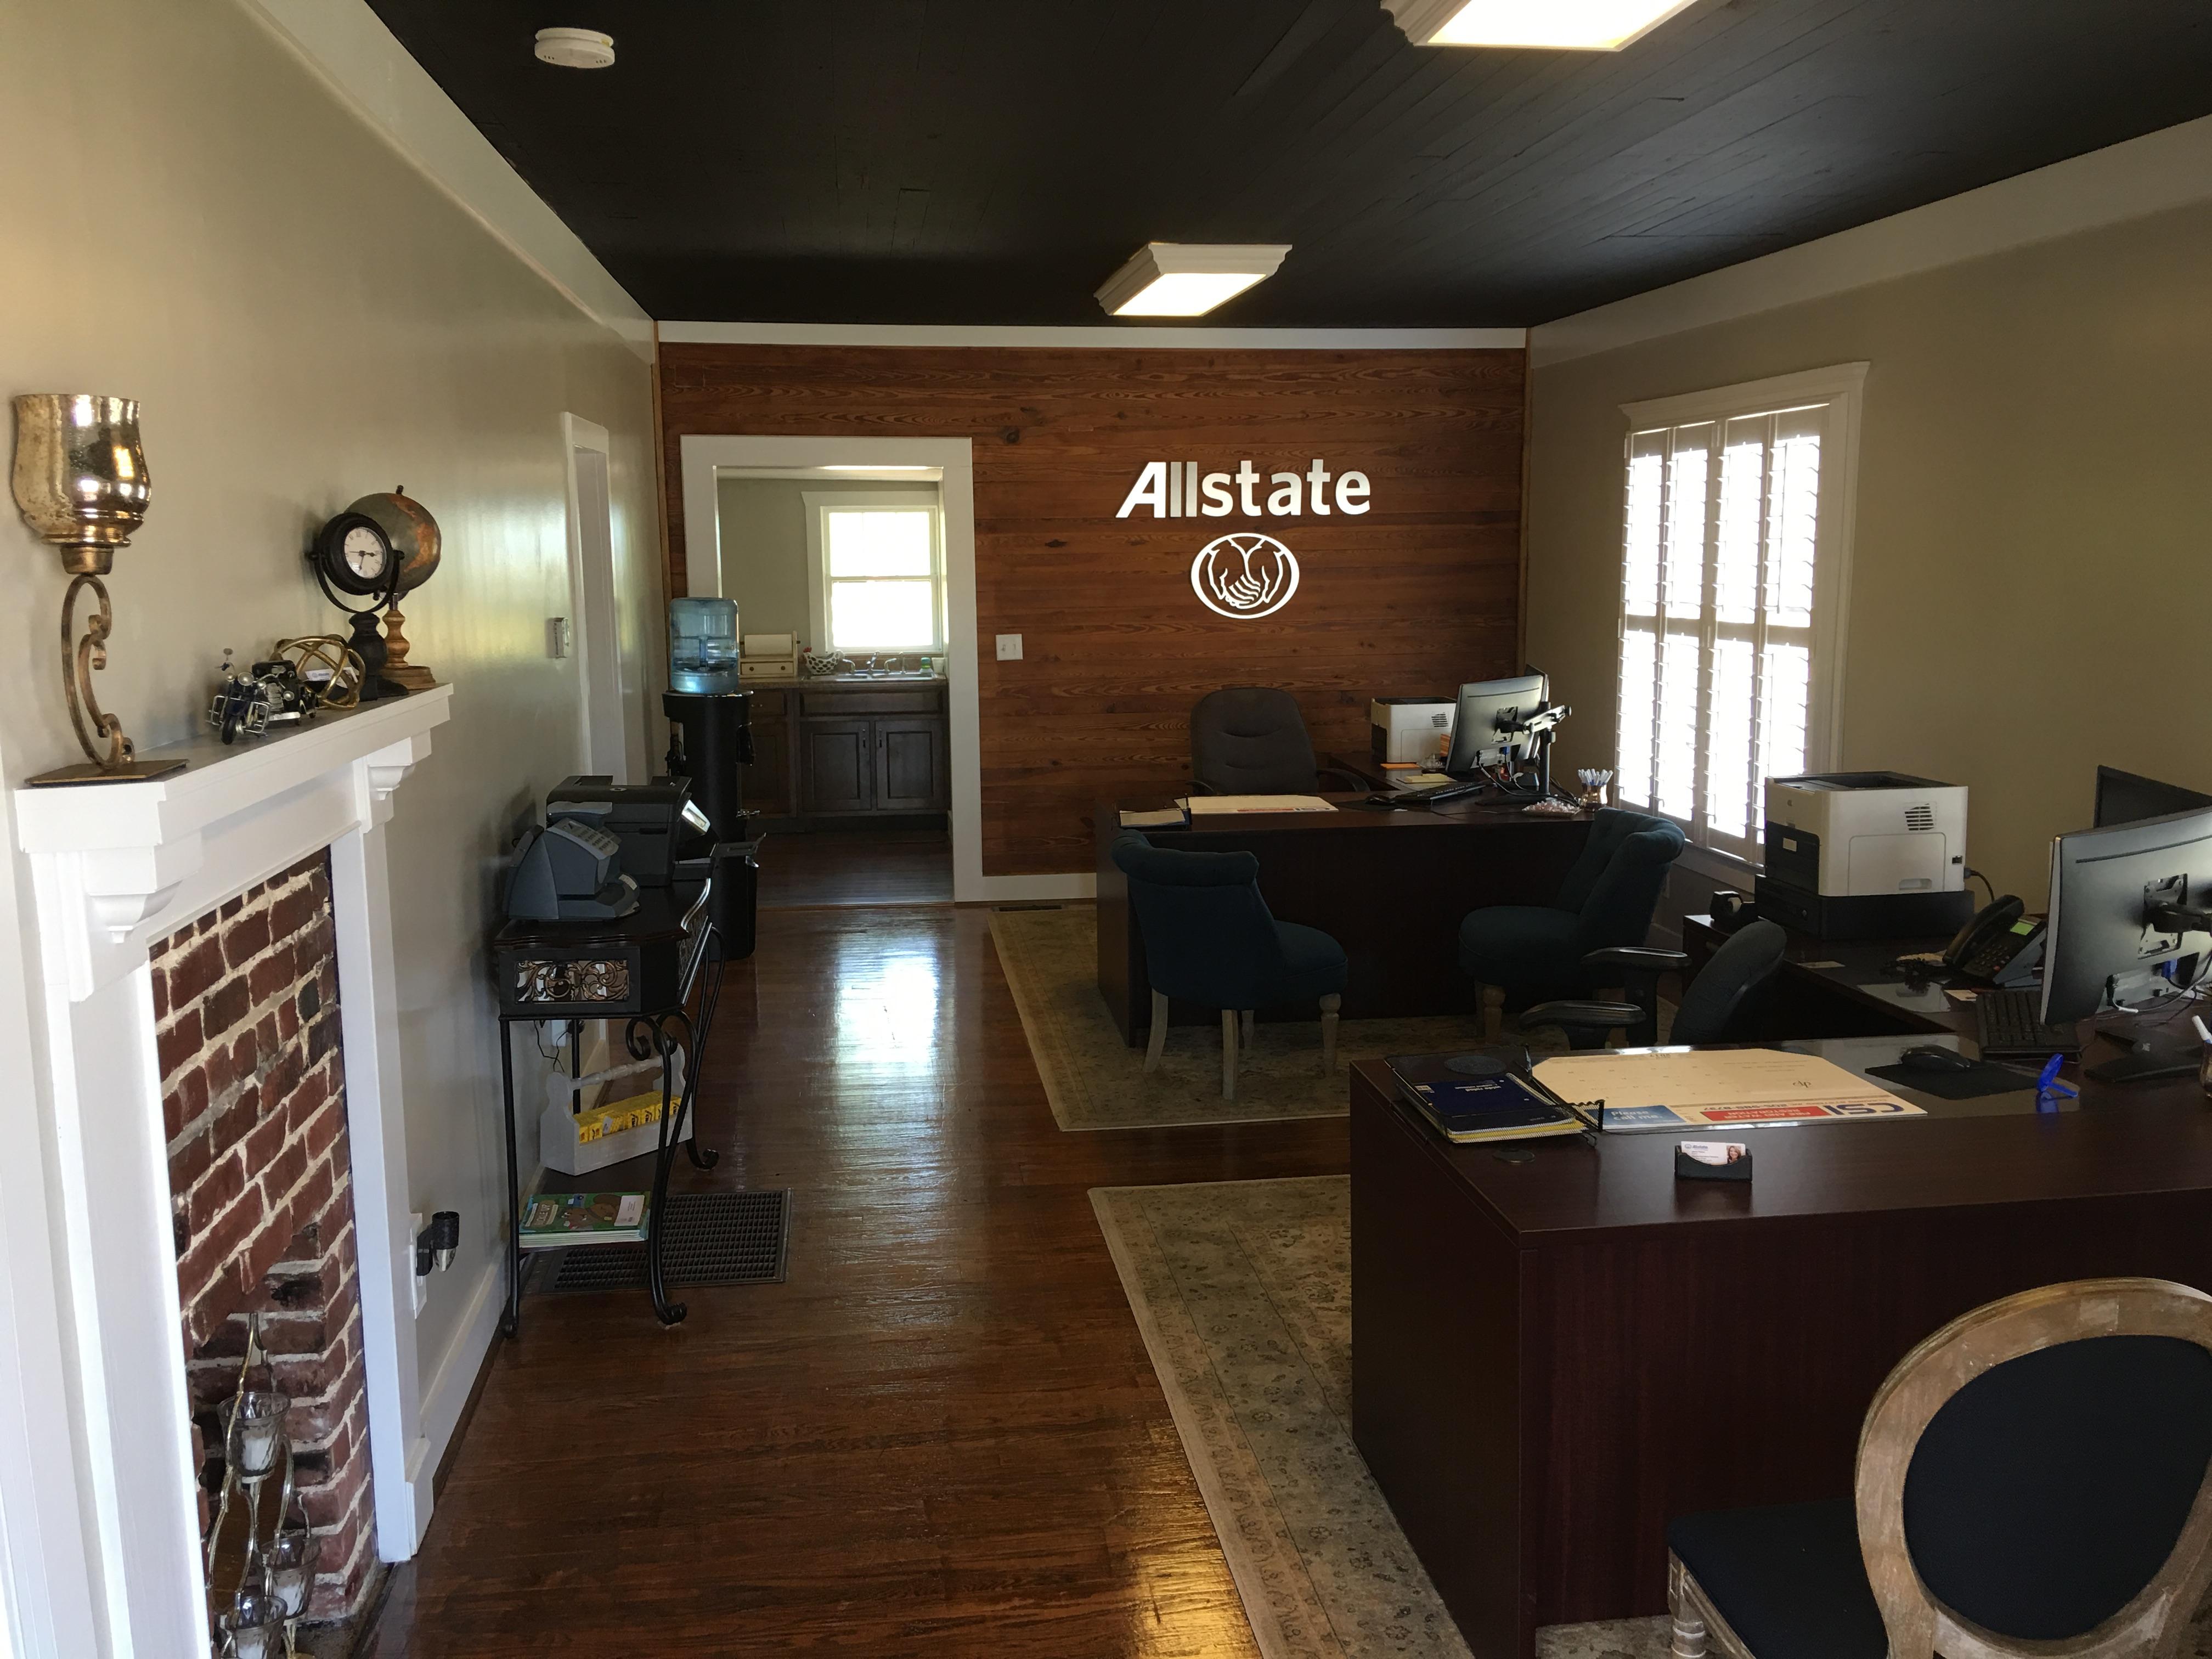 Allstate Insurance Agent: Jalona Patton image 4